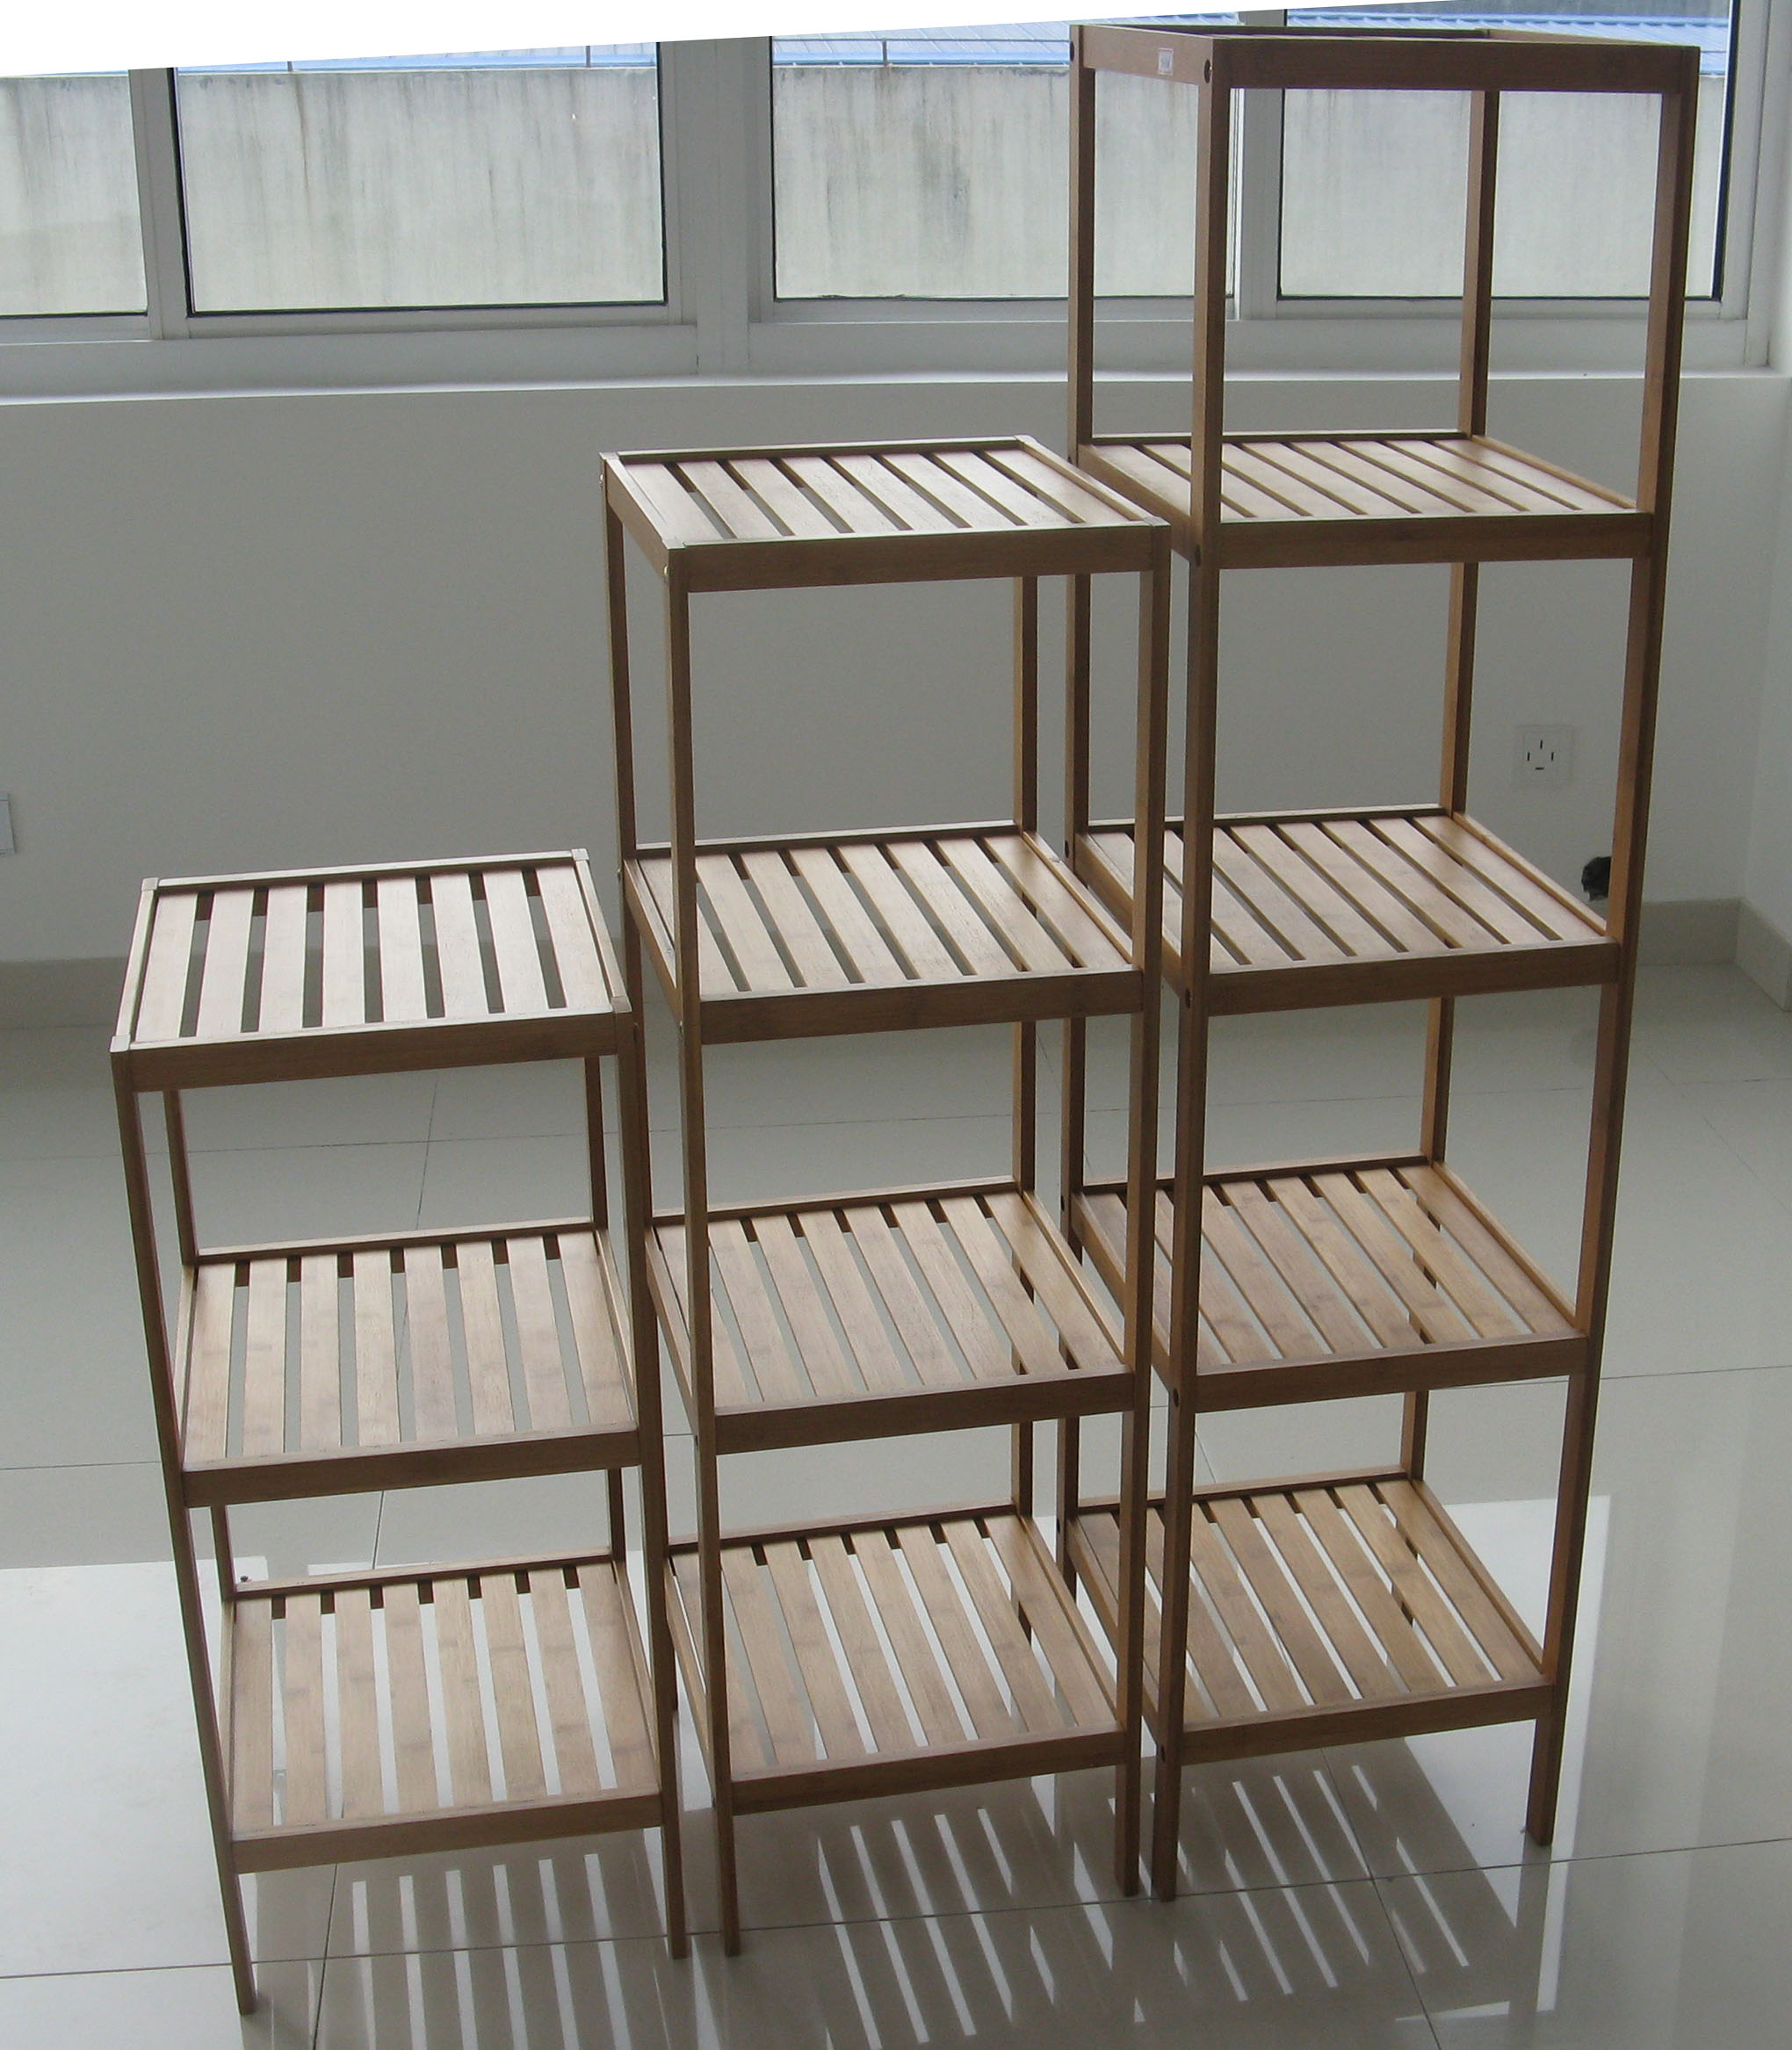 bamboo storage shelf greenbamboofurniture